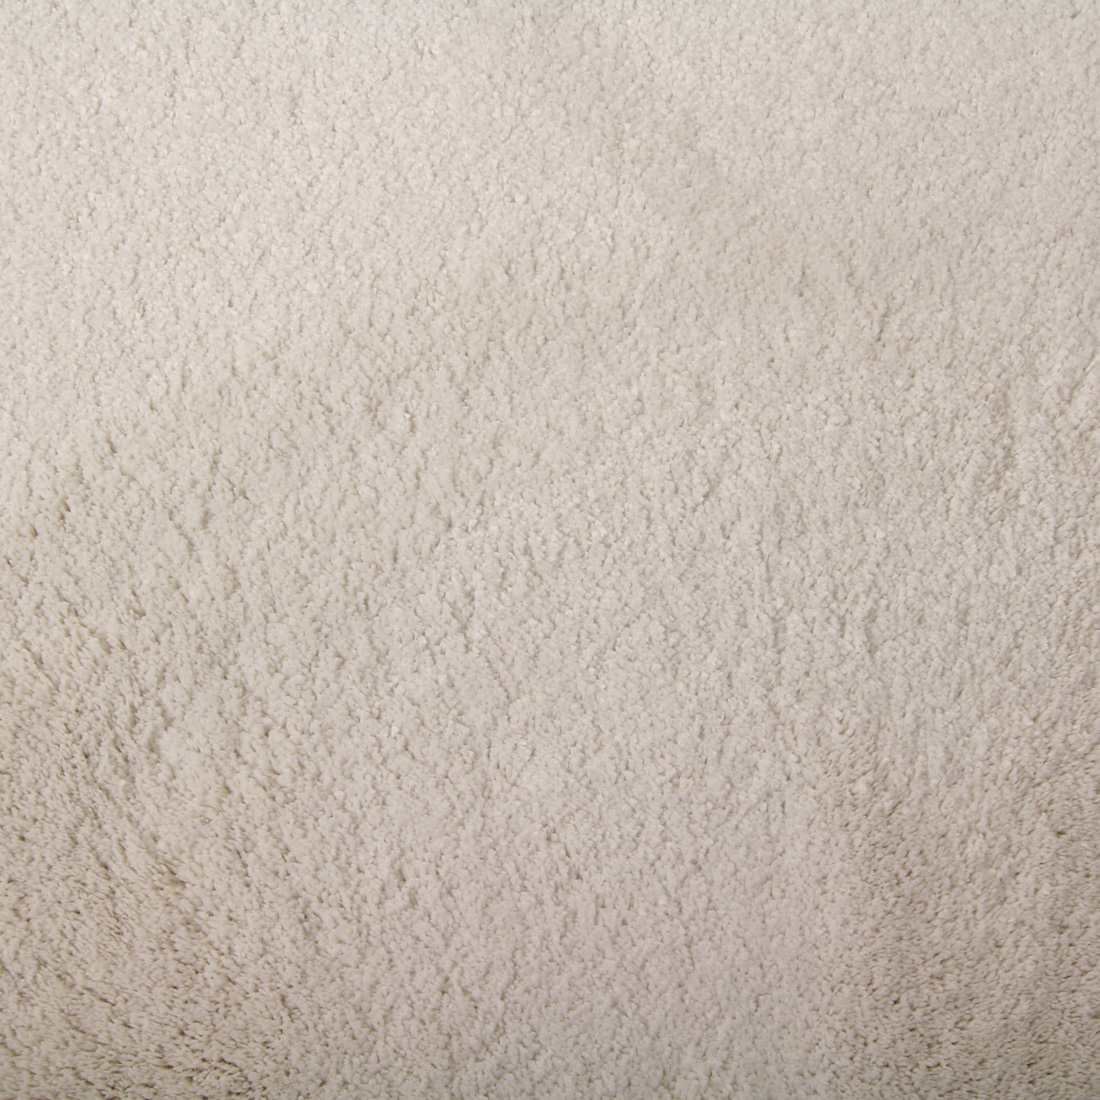 Vloerkleed Xilento Touch Canvas (extra zacht)